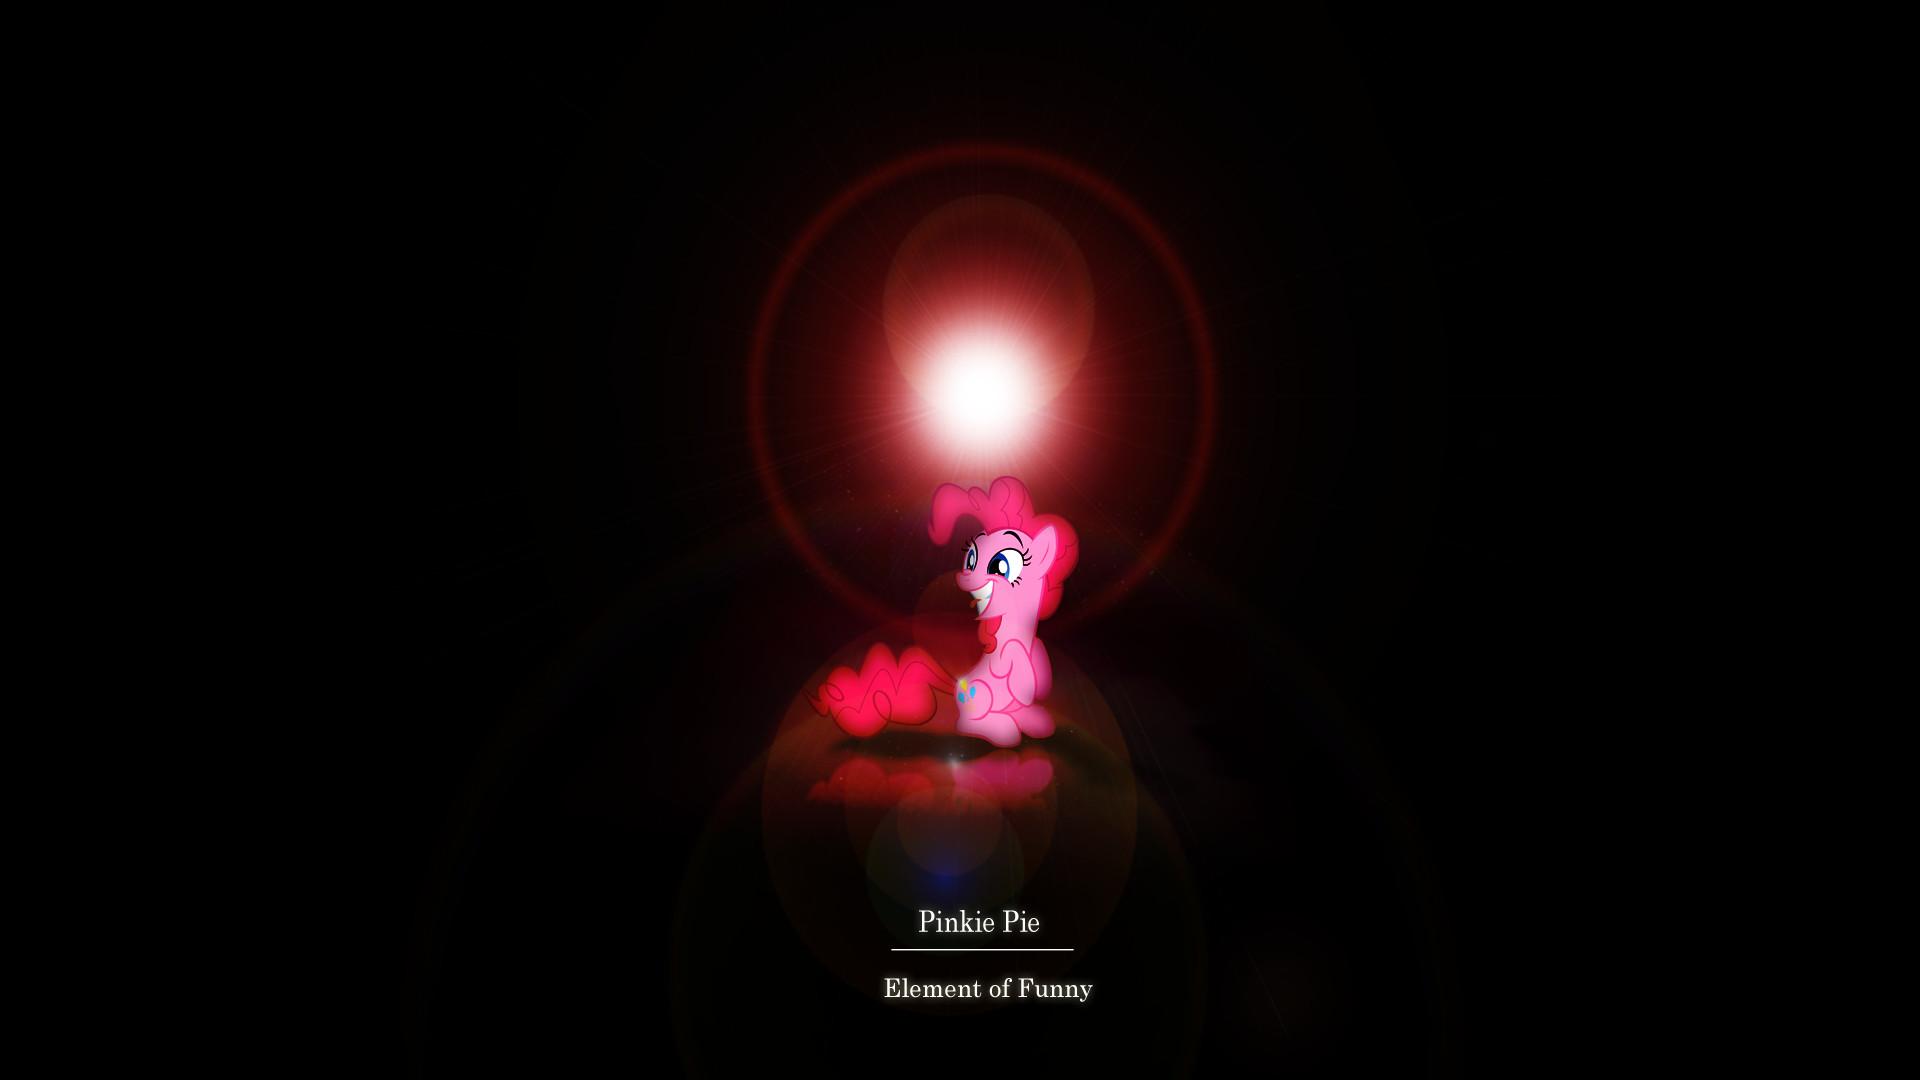 … Element of Funny – Pinkie Pie Wallpaper by Zoekleinman